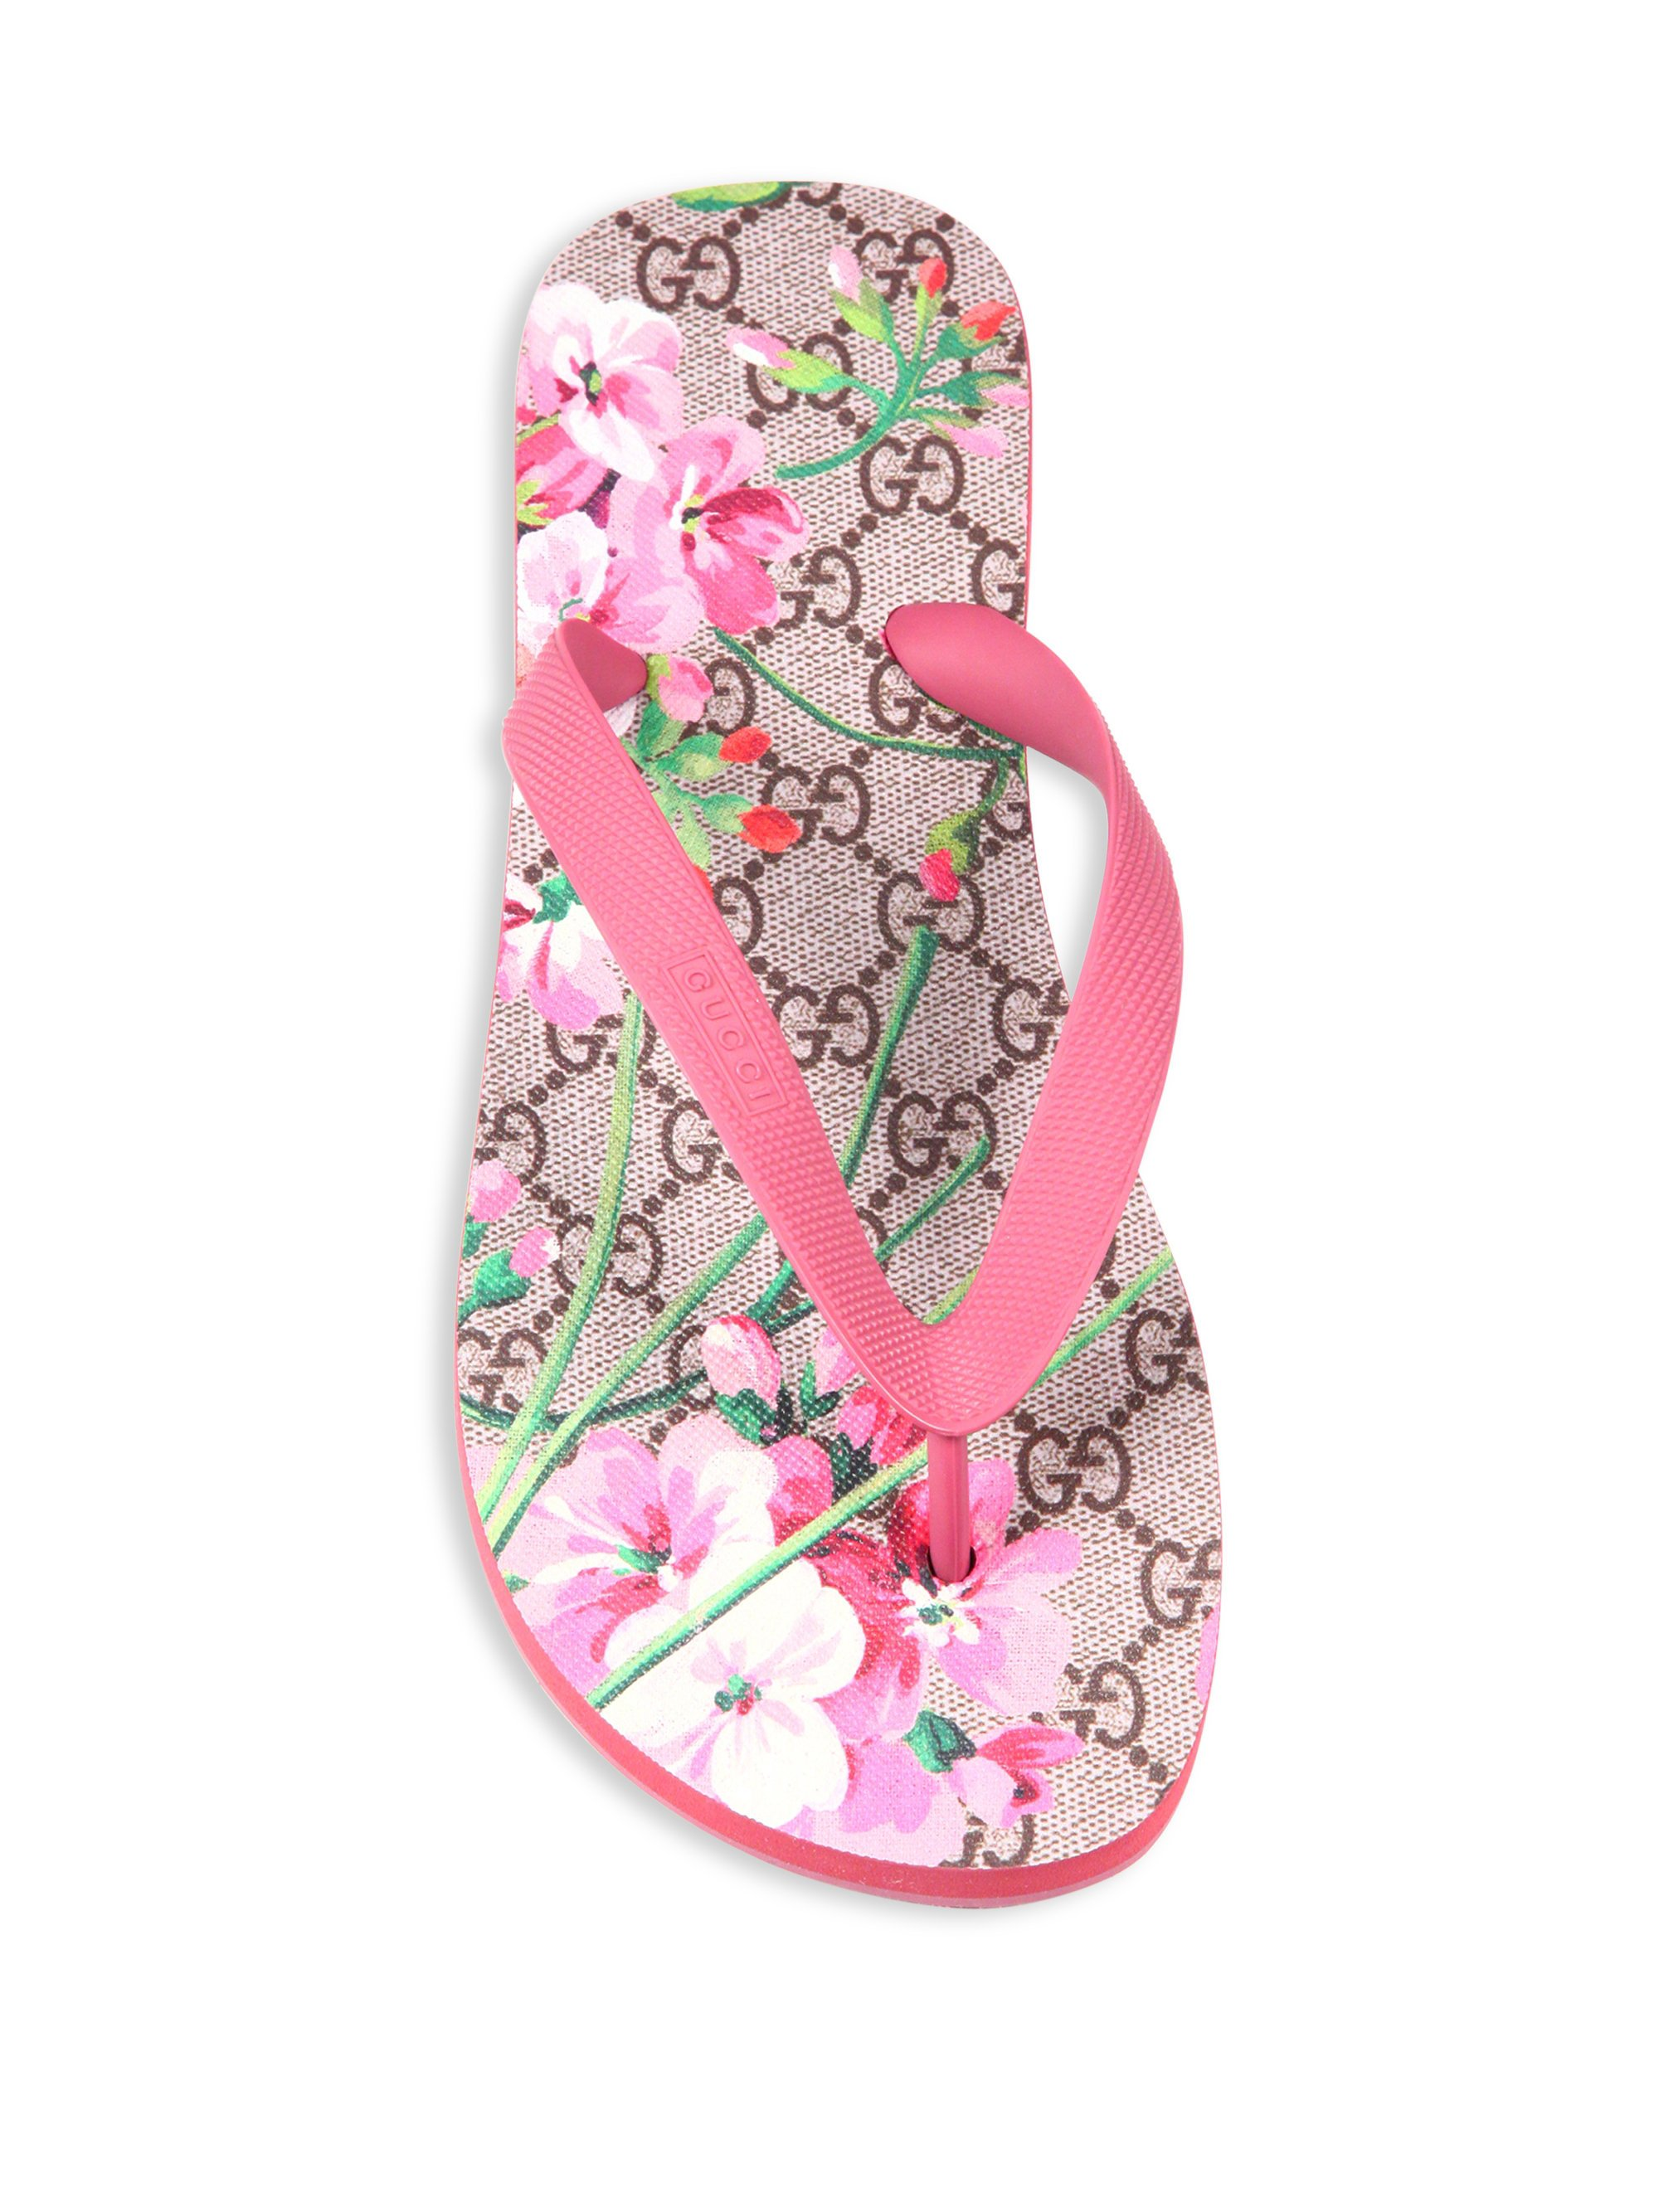 Lyst Gucci Gg Bloom Rubber Flip Flops In Pink